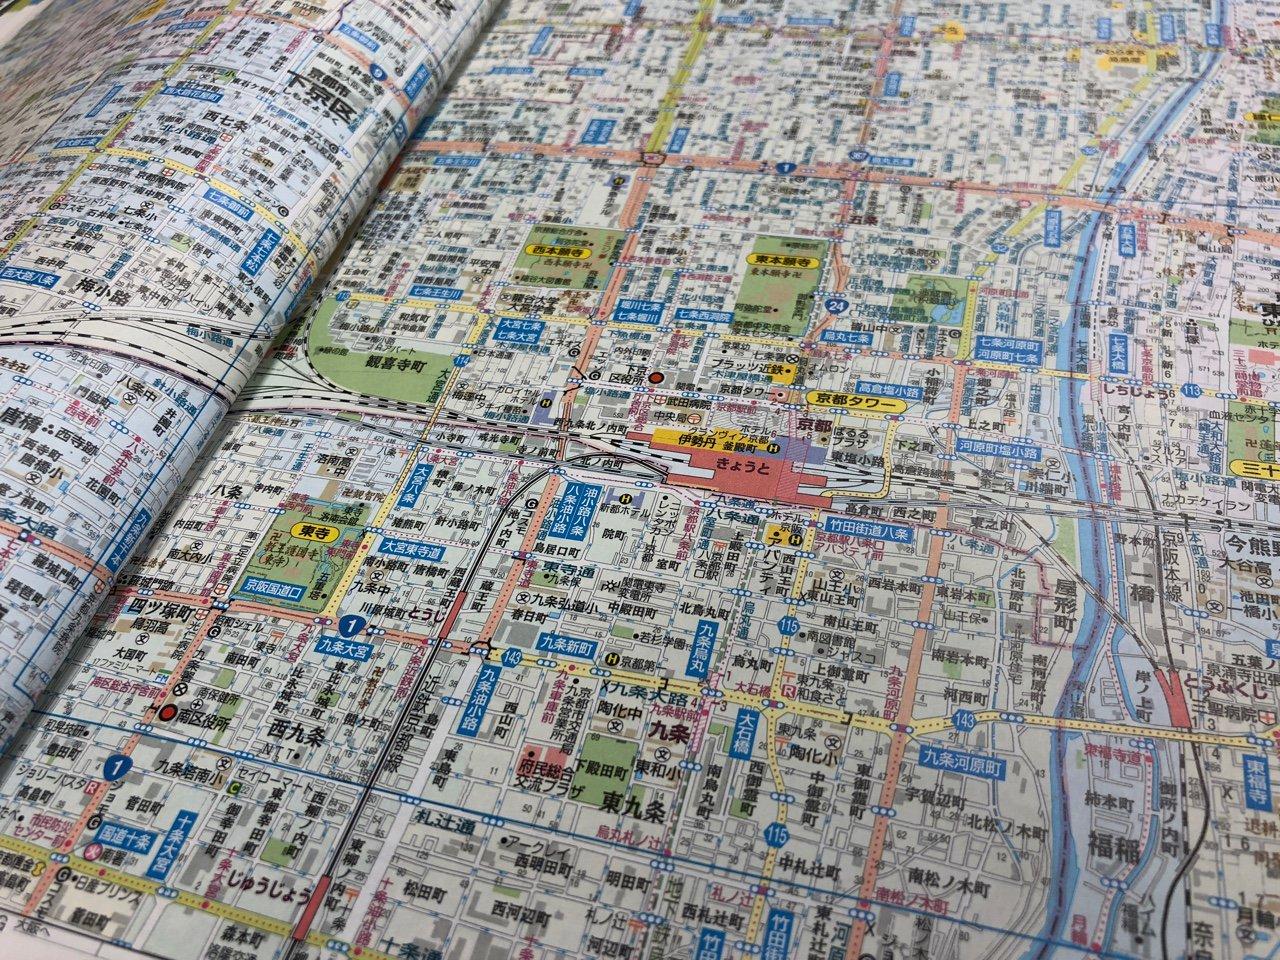 京都。  アトラスRDX 関西道路地図 B5 (2004年3月発行) https://t.co/j9pxbxQpKc